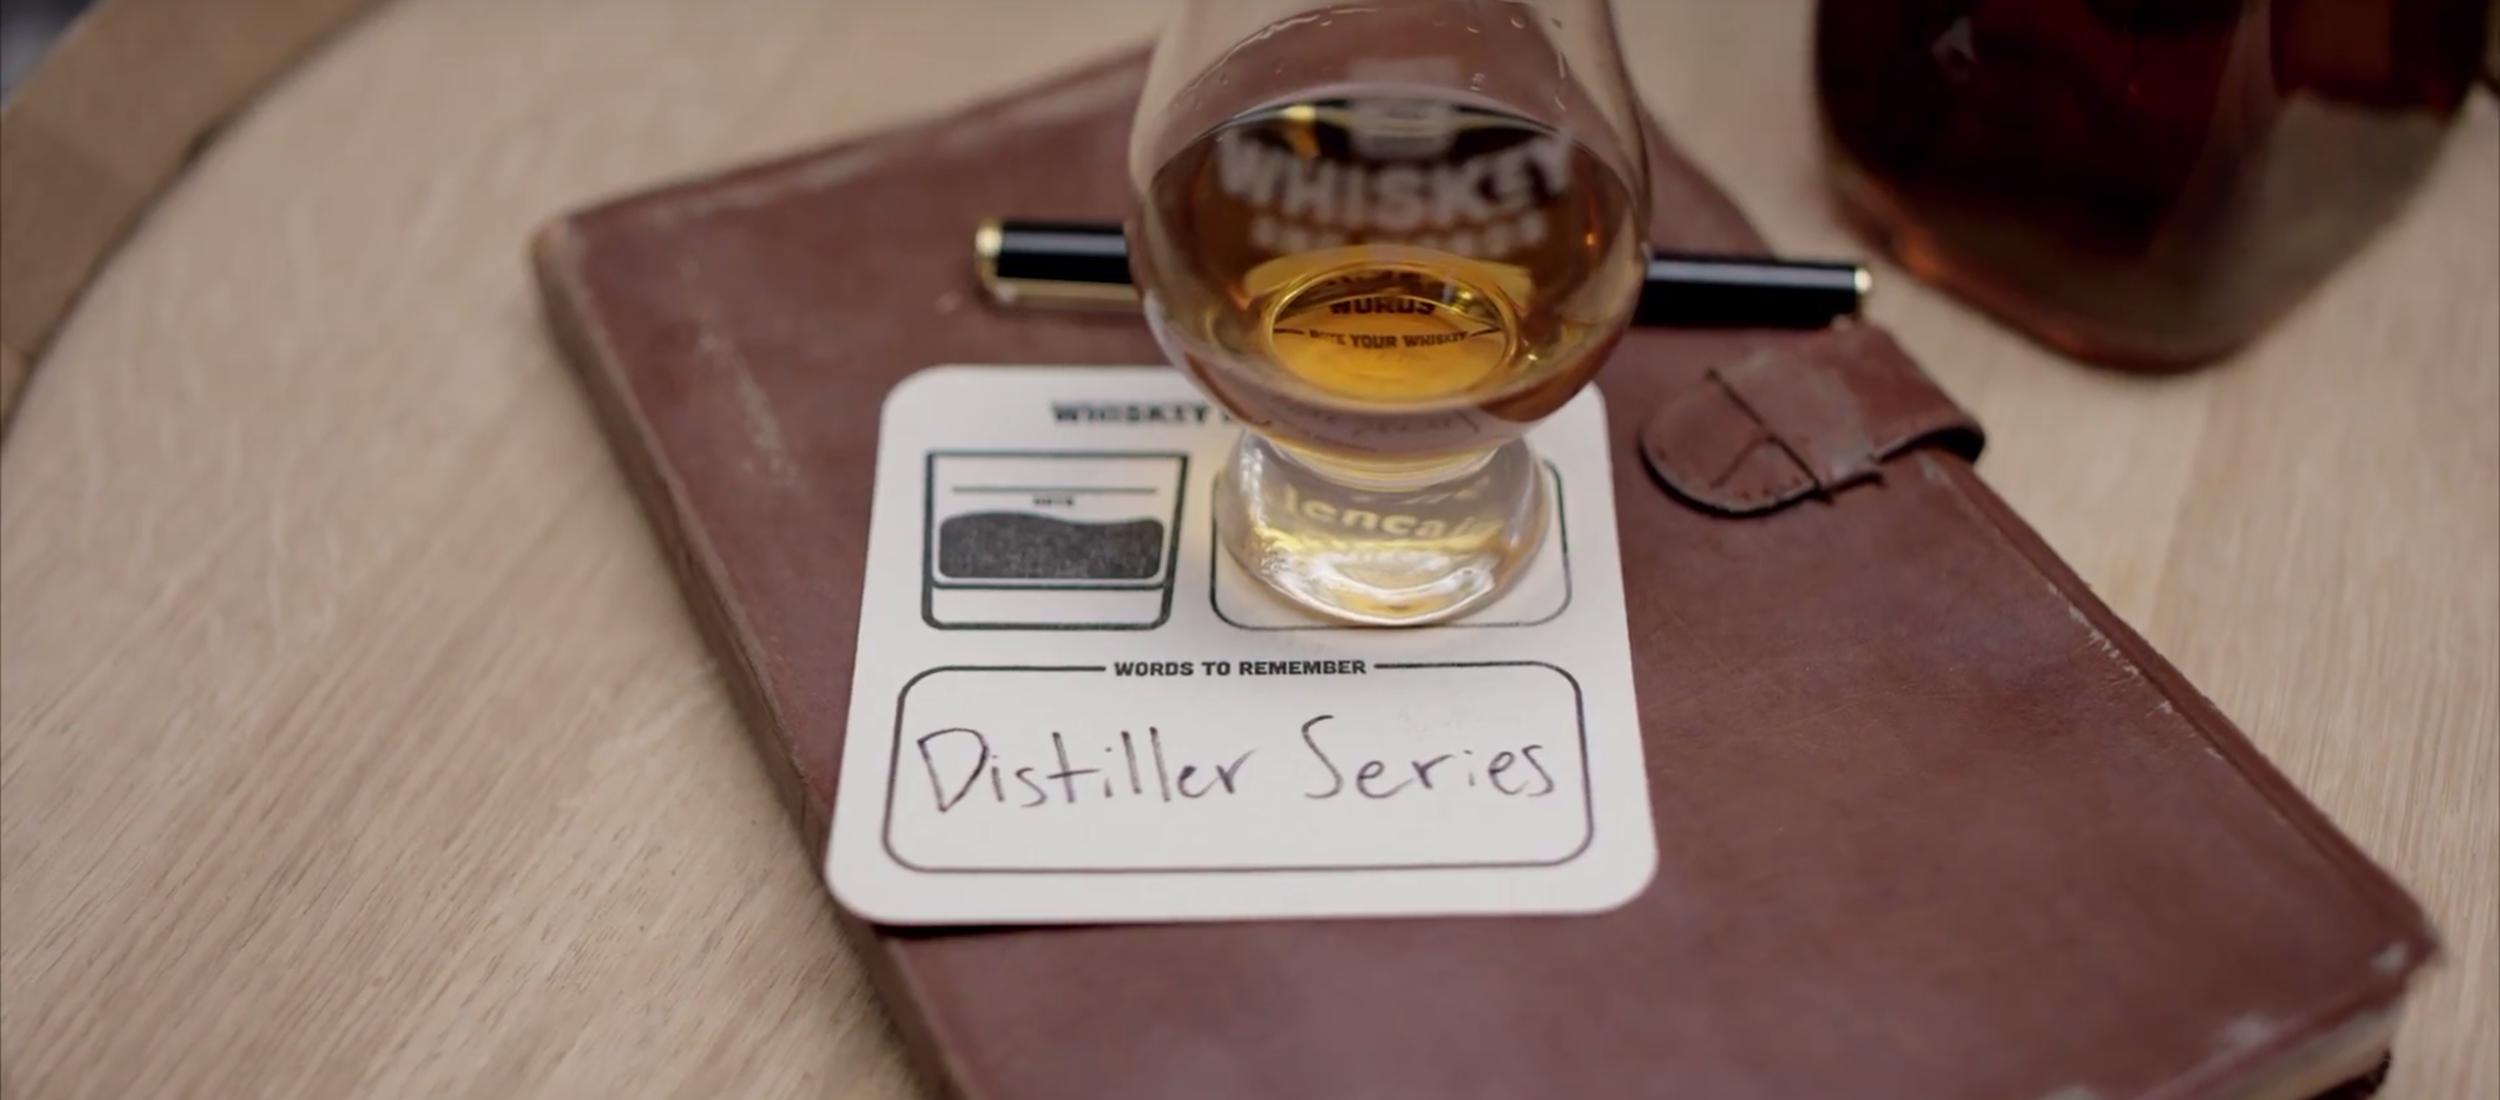 Distiller-series-title-card.png